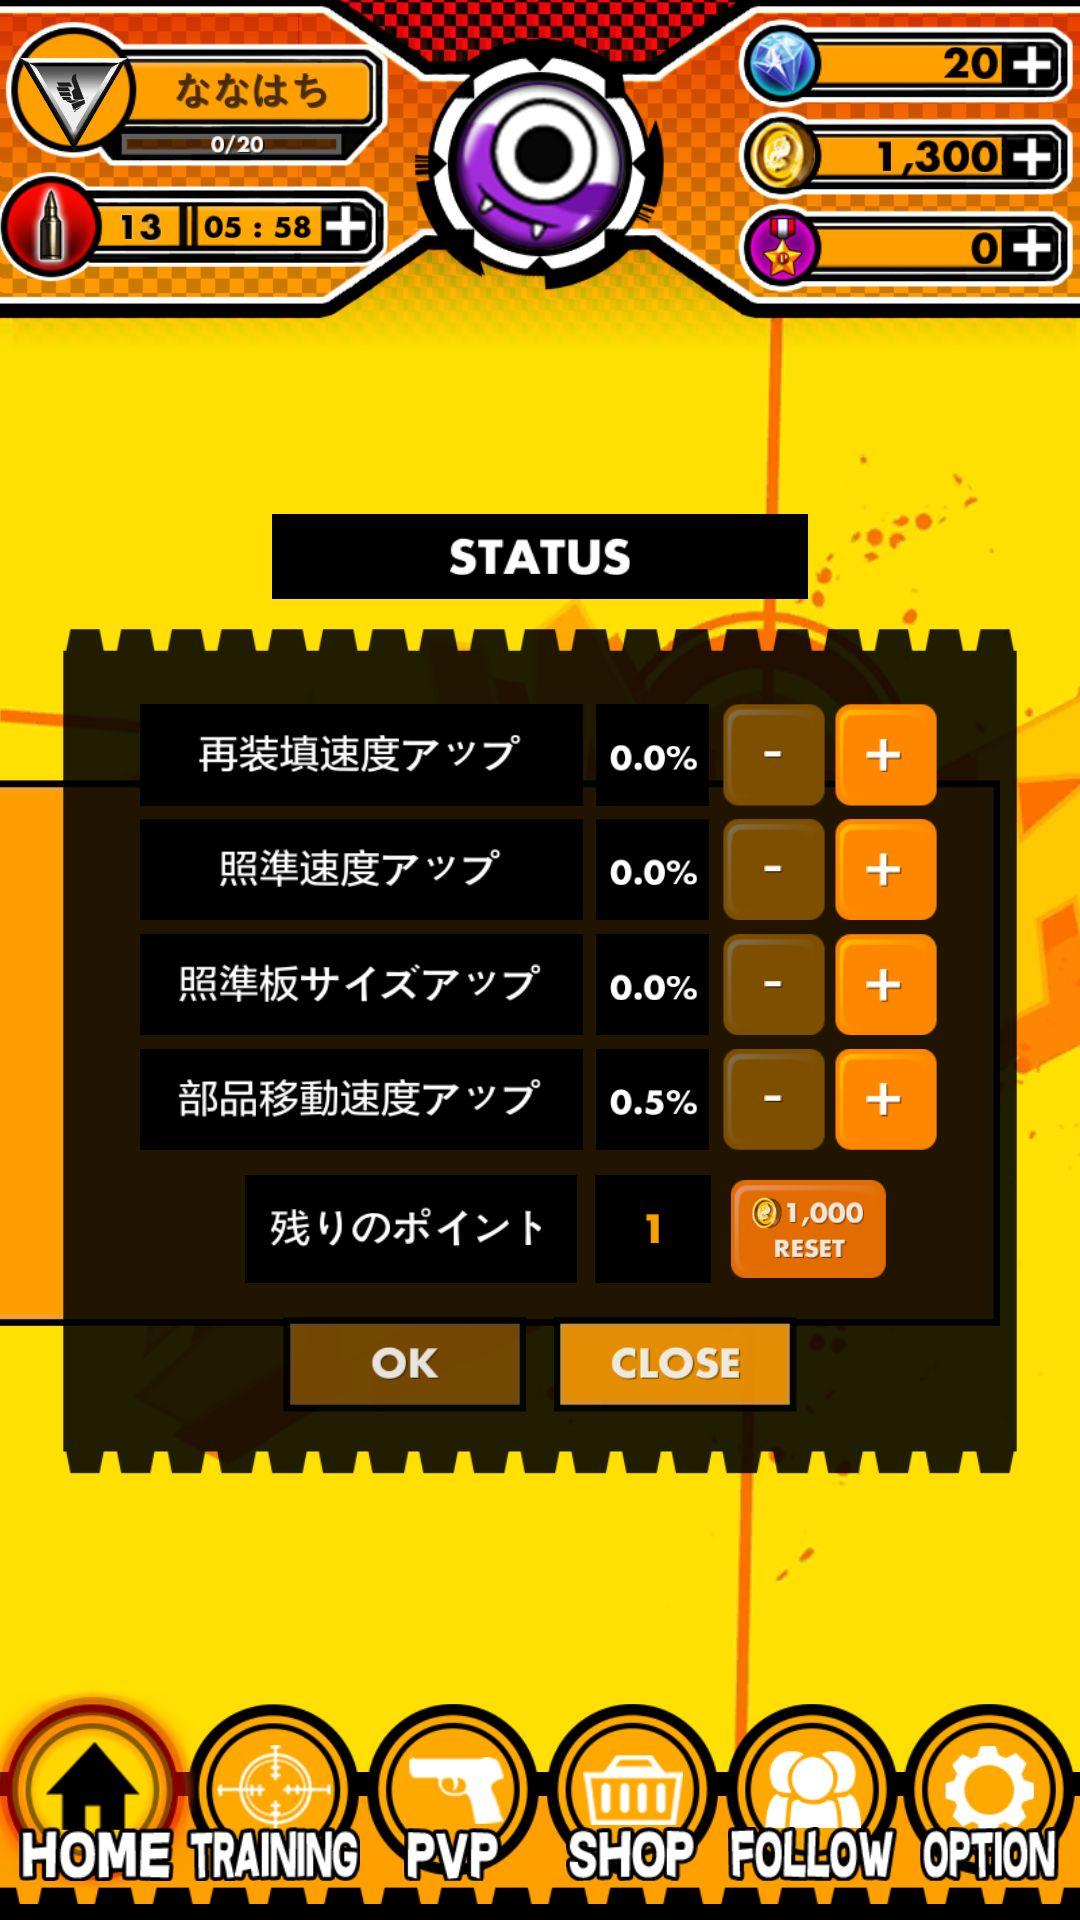 androidアプリ ガンスリンガー(GunSlinger - The Fast Gun)攻略スクリーンショット5